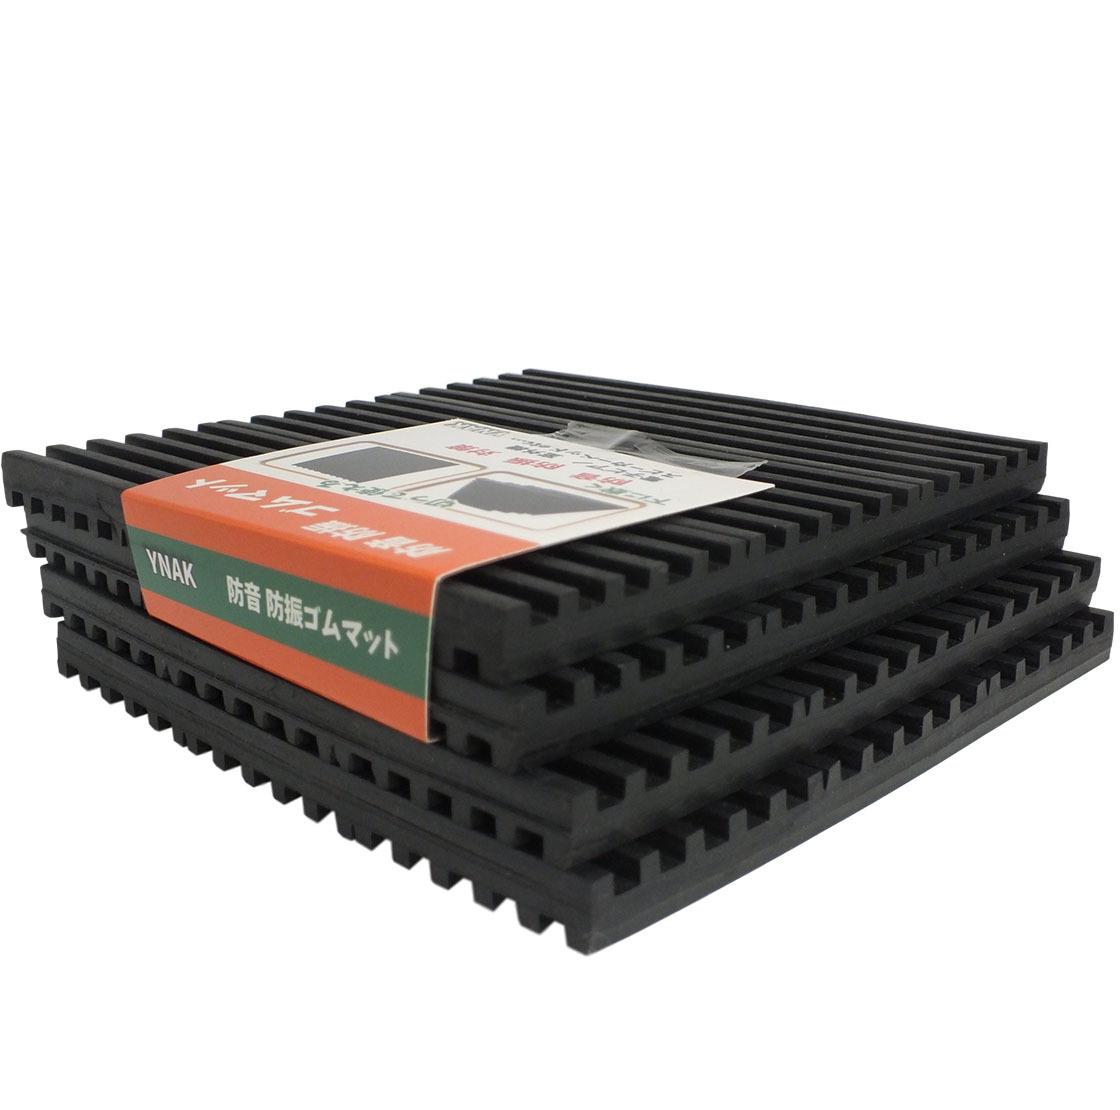 YNAK ピアノ スピーカー 家庭用機器 下に敷く 滑り止め ゴム マット セット 防振 防音 対策 (15cm×15cm×1cm 4枚)